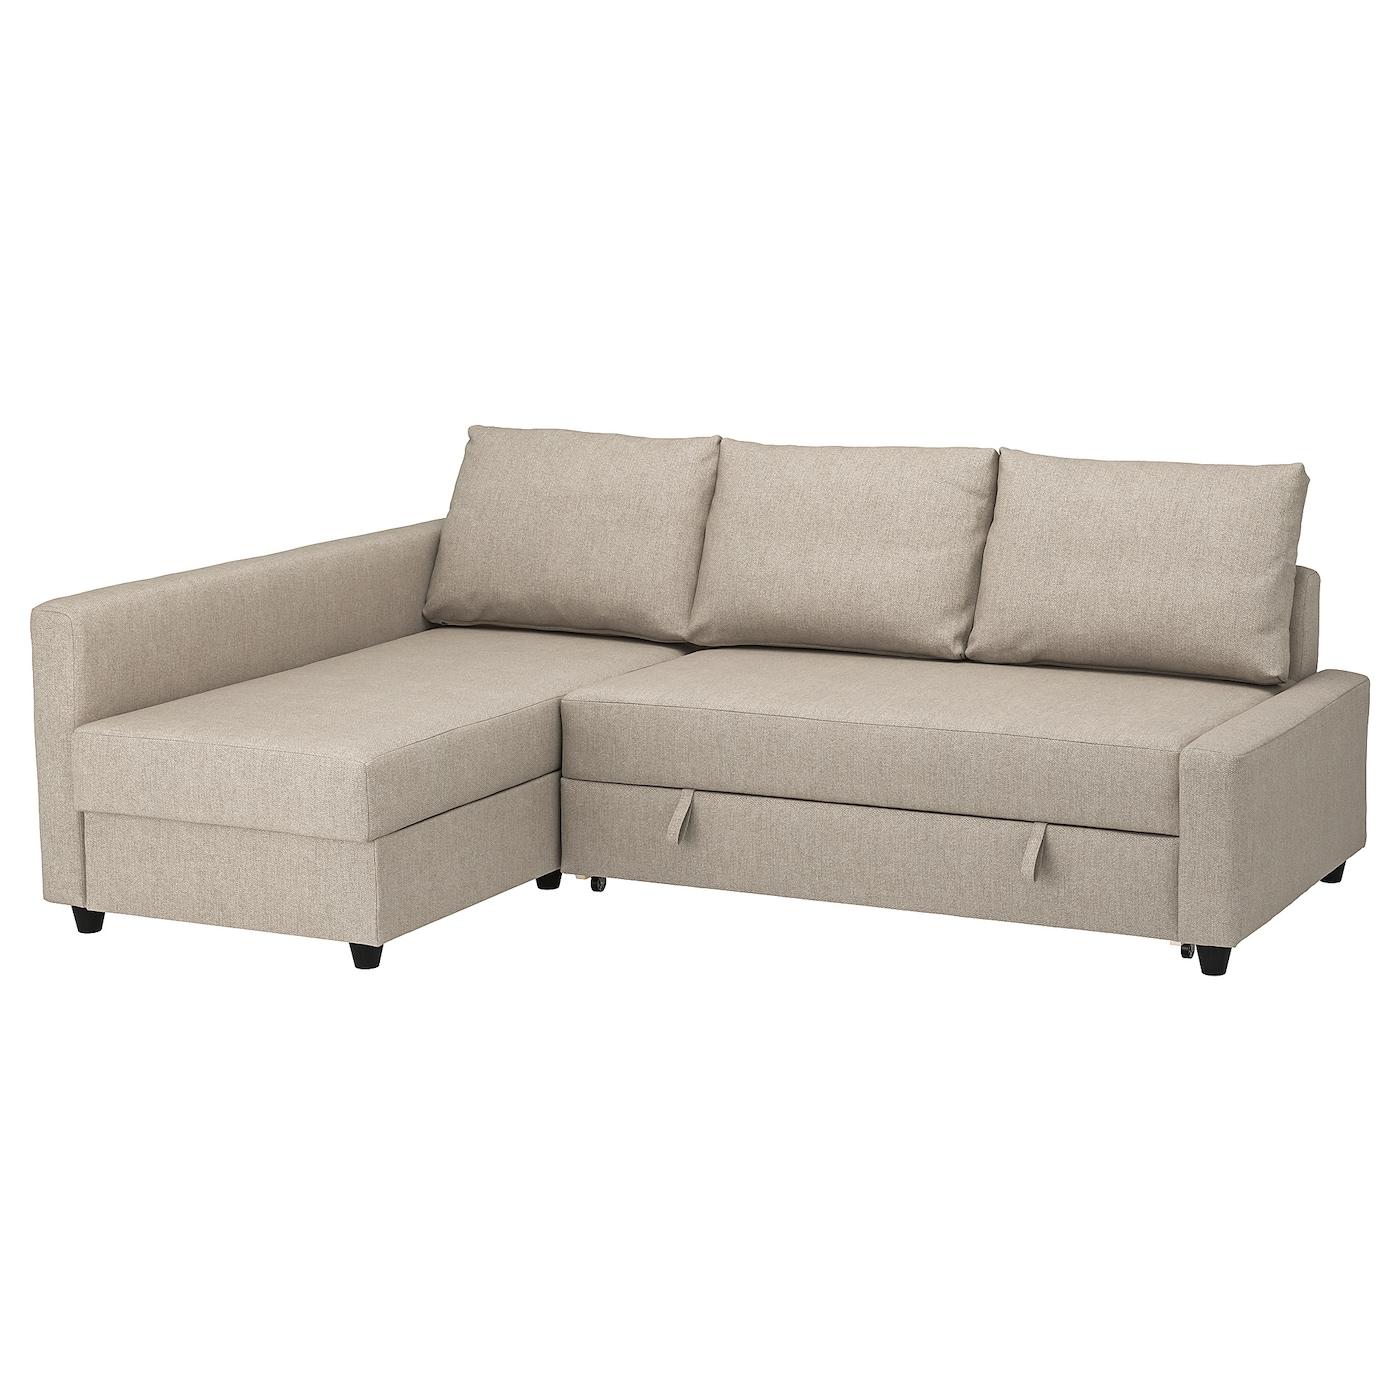 FRIHETEN - Sleeper sectional,3 seat w/storage, Skiftebo dark gray